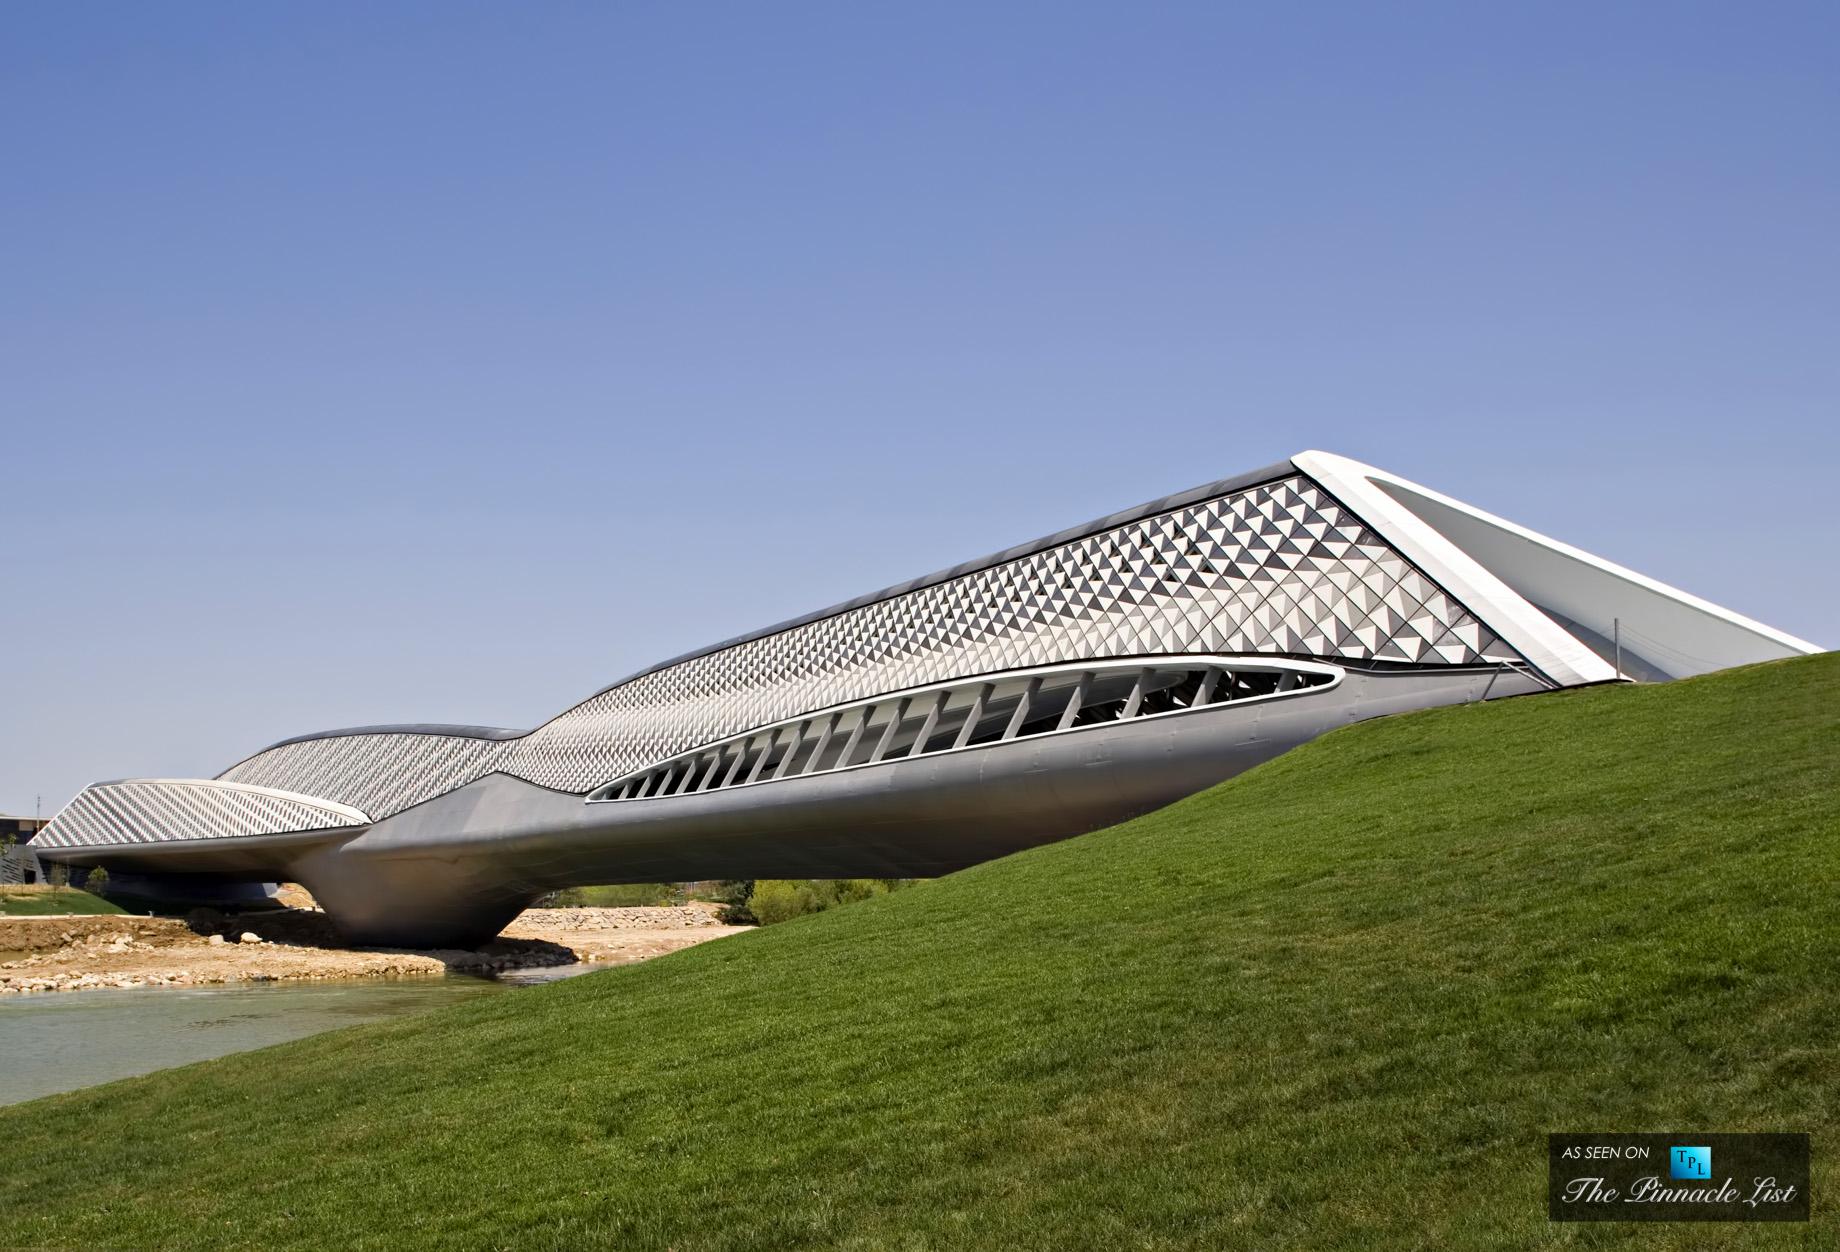 Zaragoza Bridge Pavillion - Zaha Hadid Architects